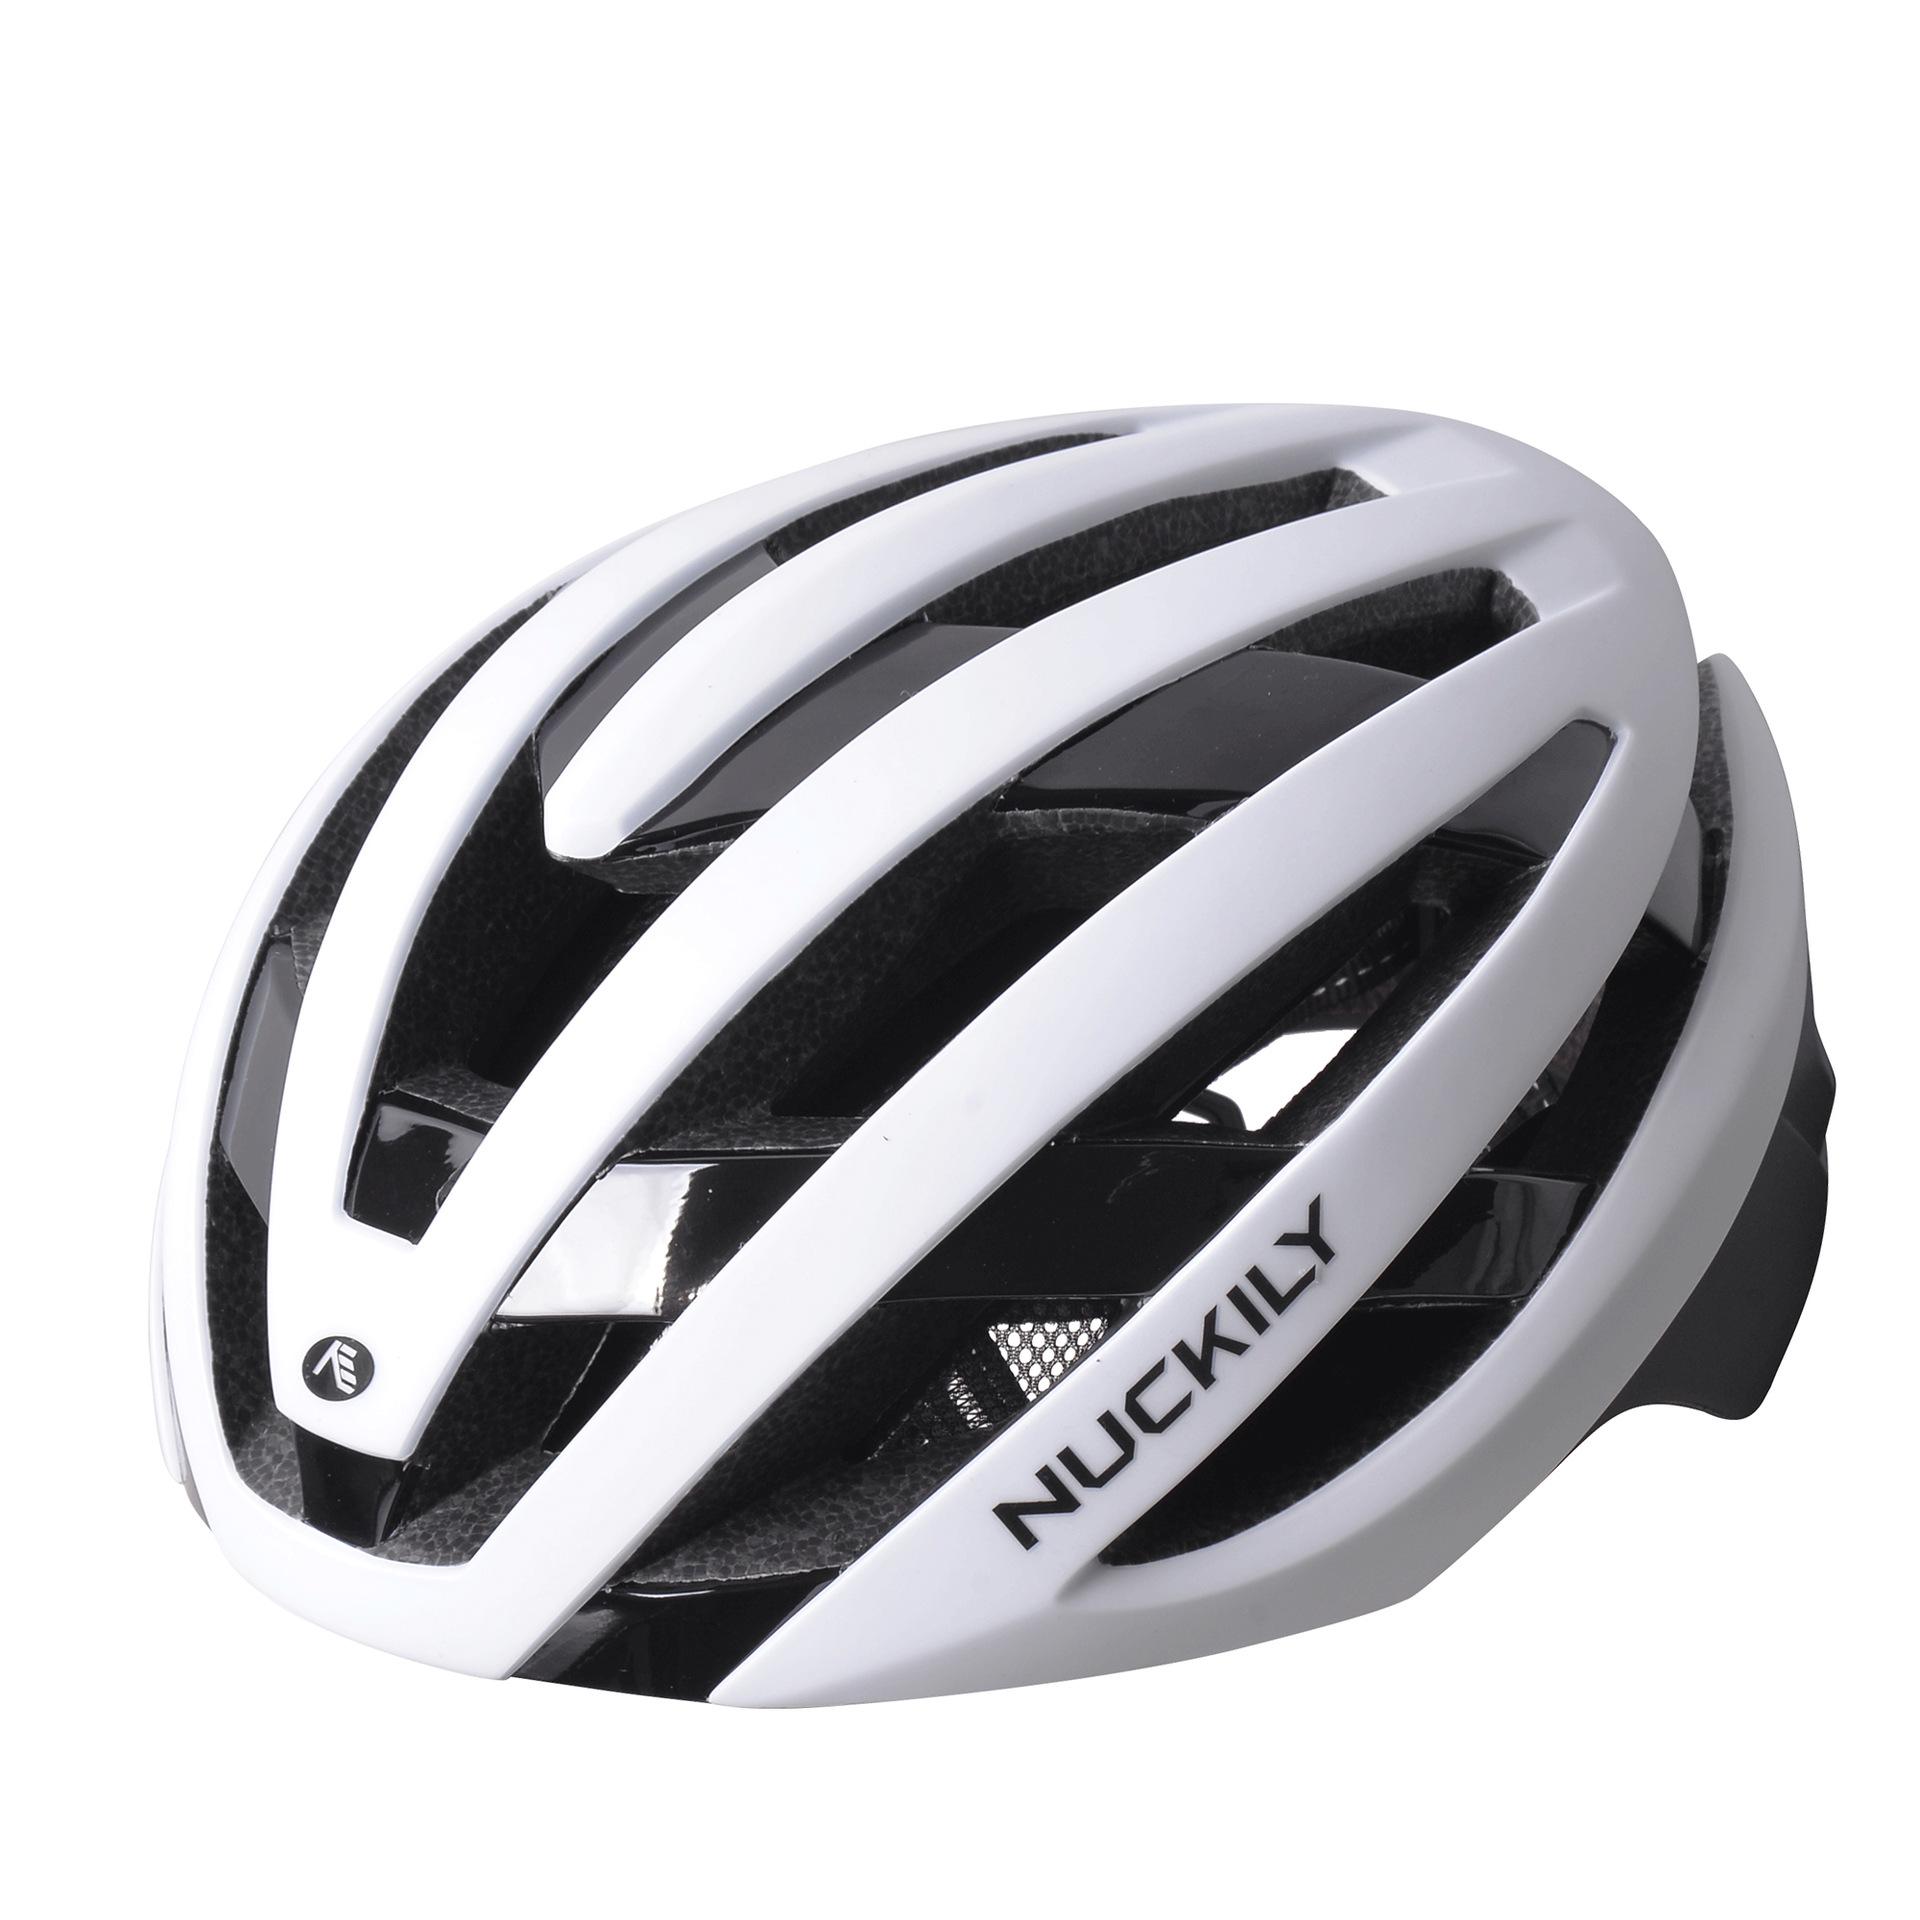 nuckily骑行头盔山地车防晒装备女男公路车安全帽夏季自行车头盔